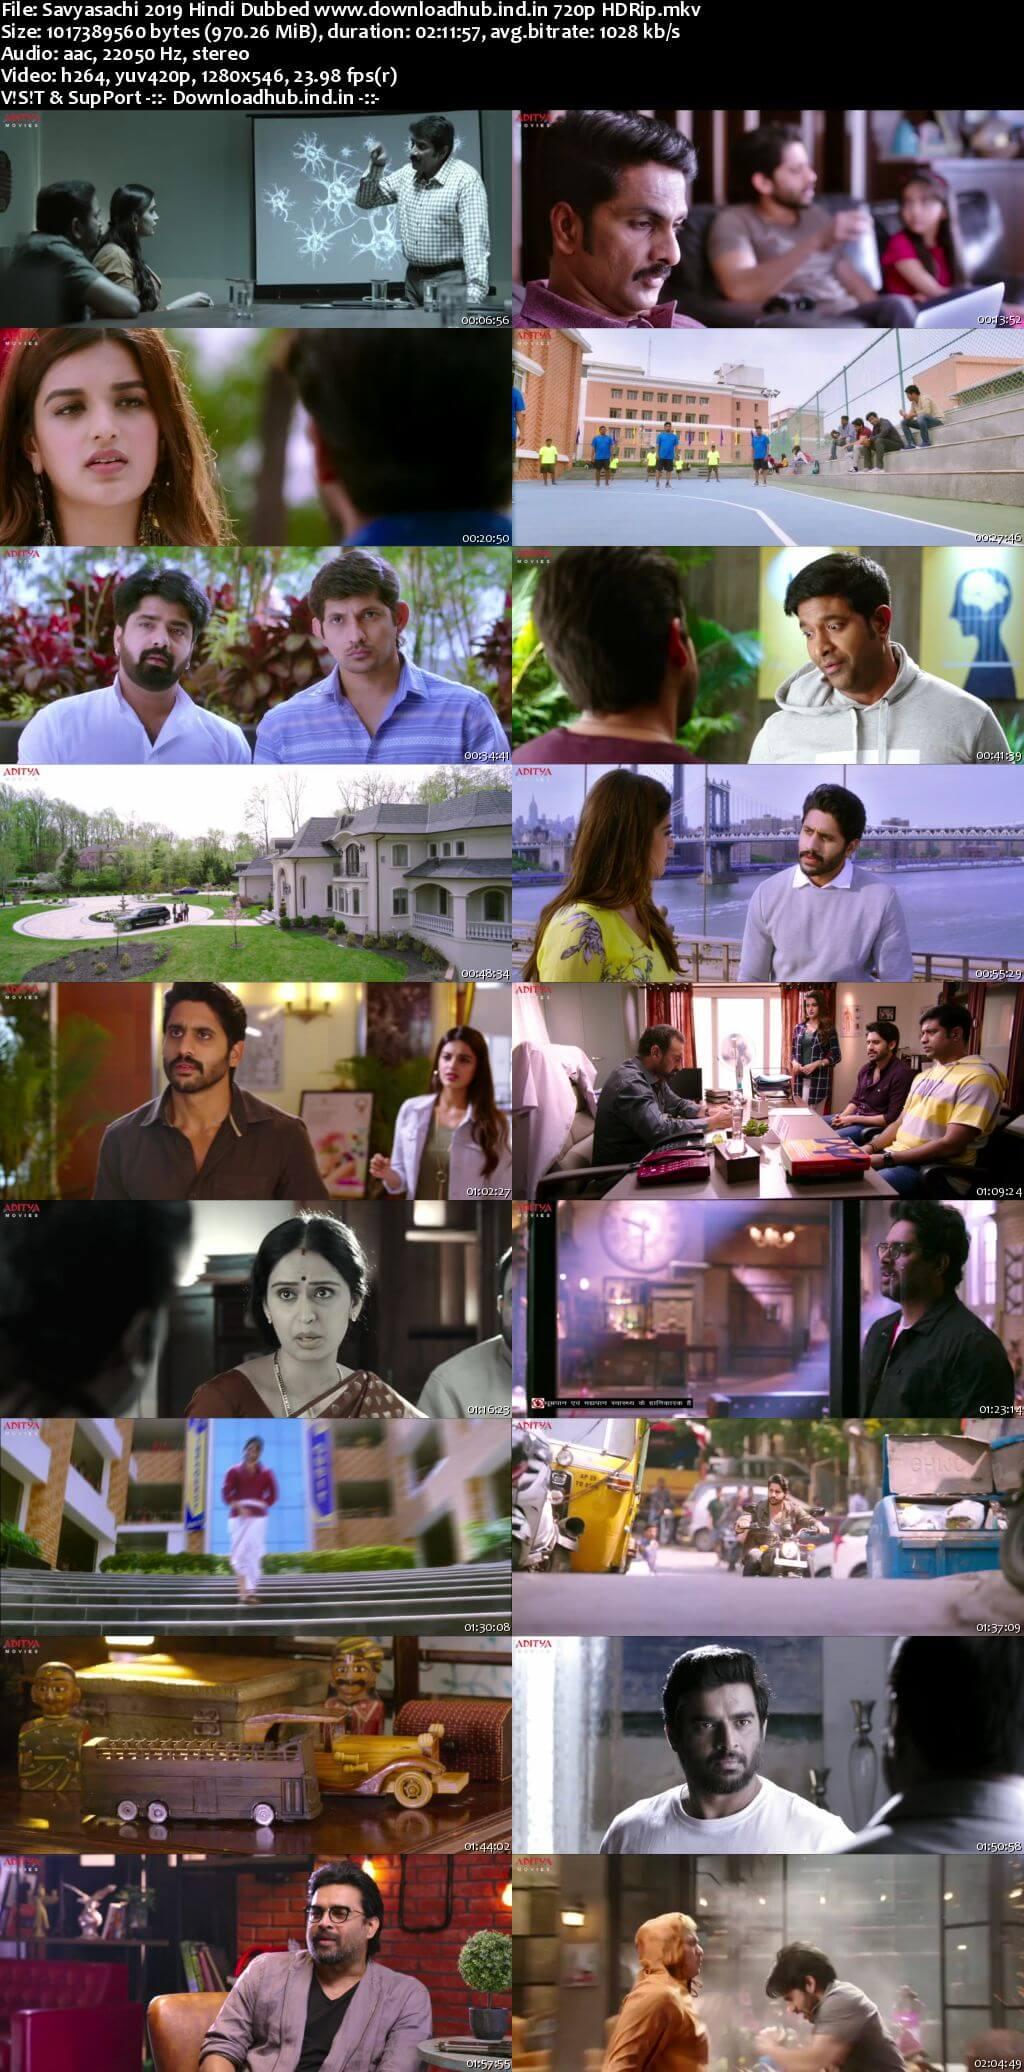 Savyasachi 2019 Hindi Dubbed 720p HDRip x264